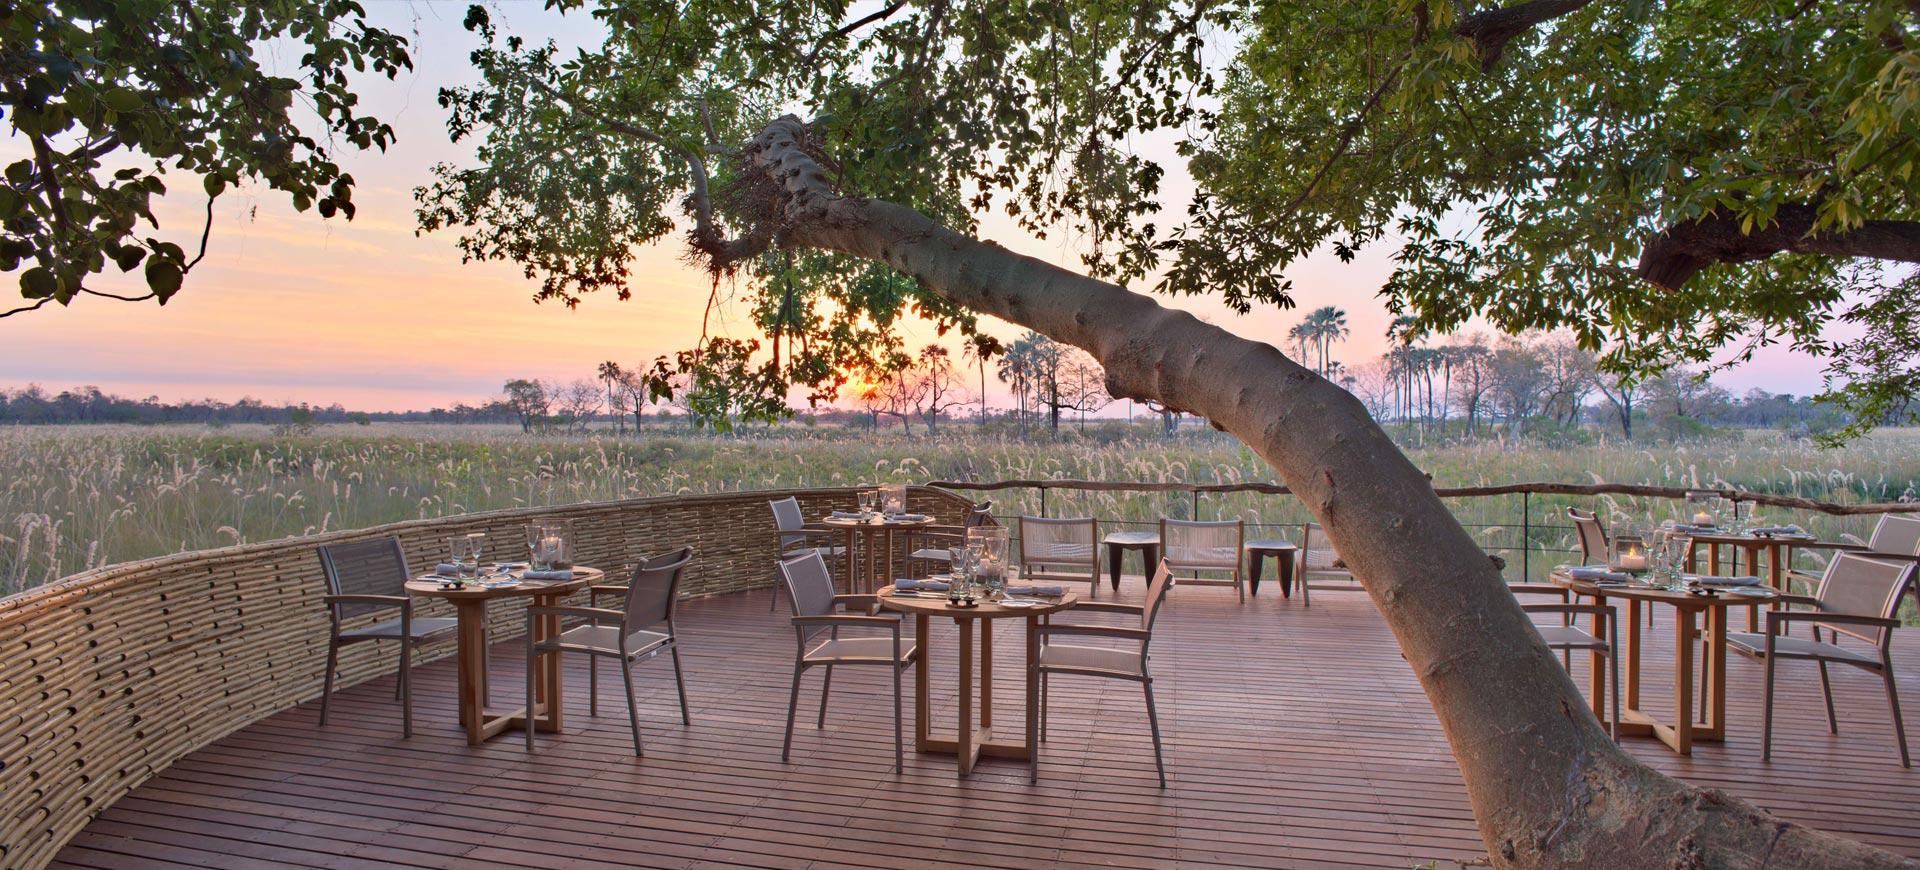 Sandibe Okavango Safari Lodges